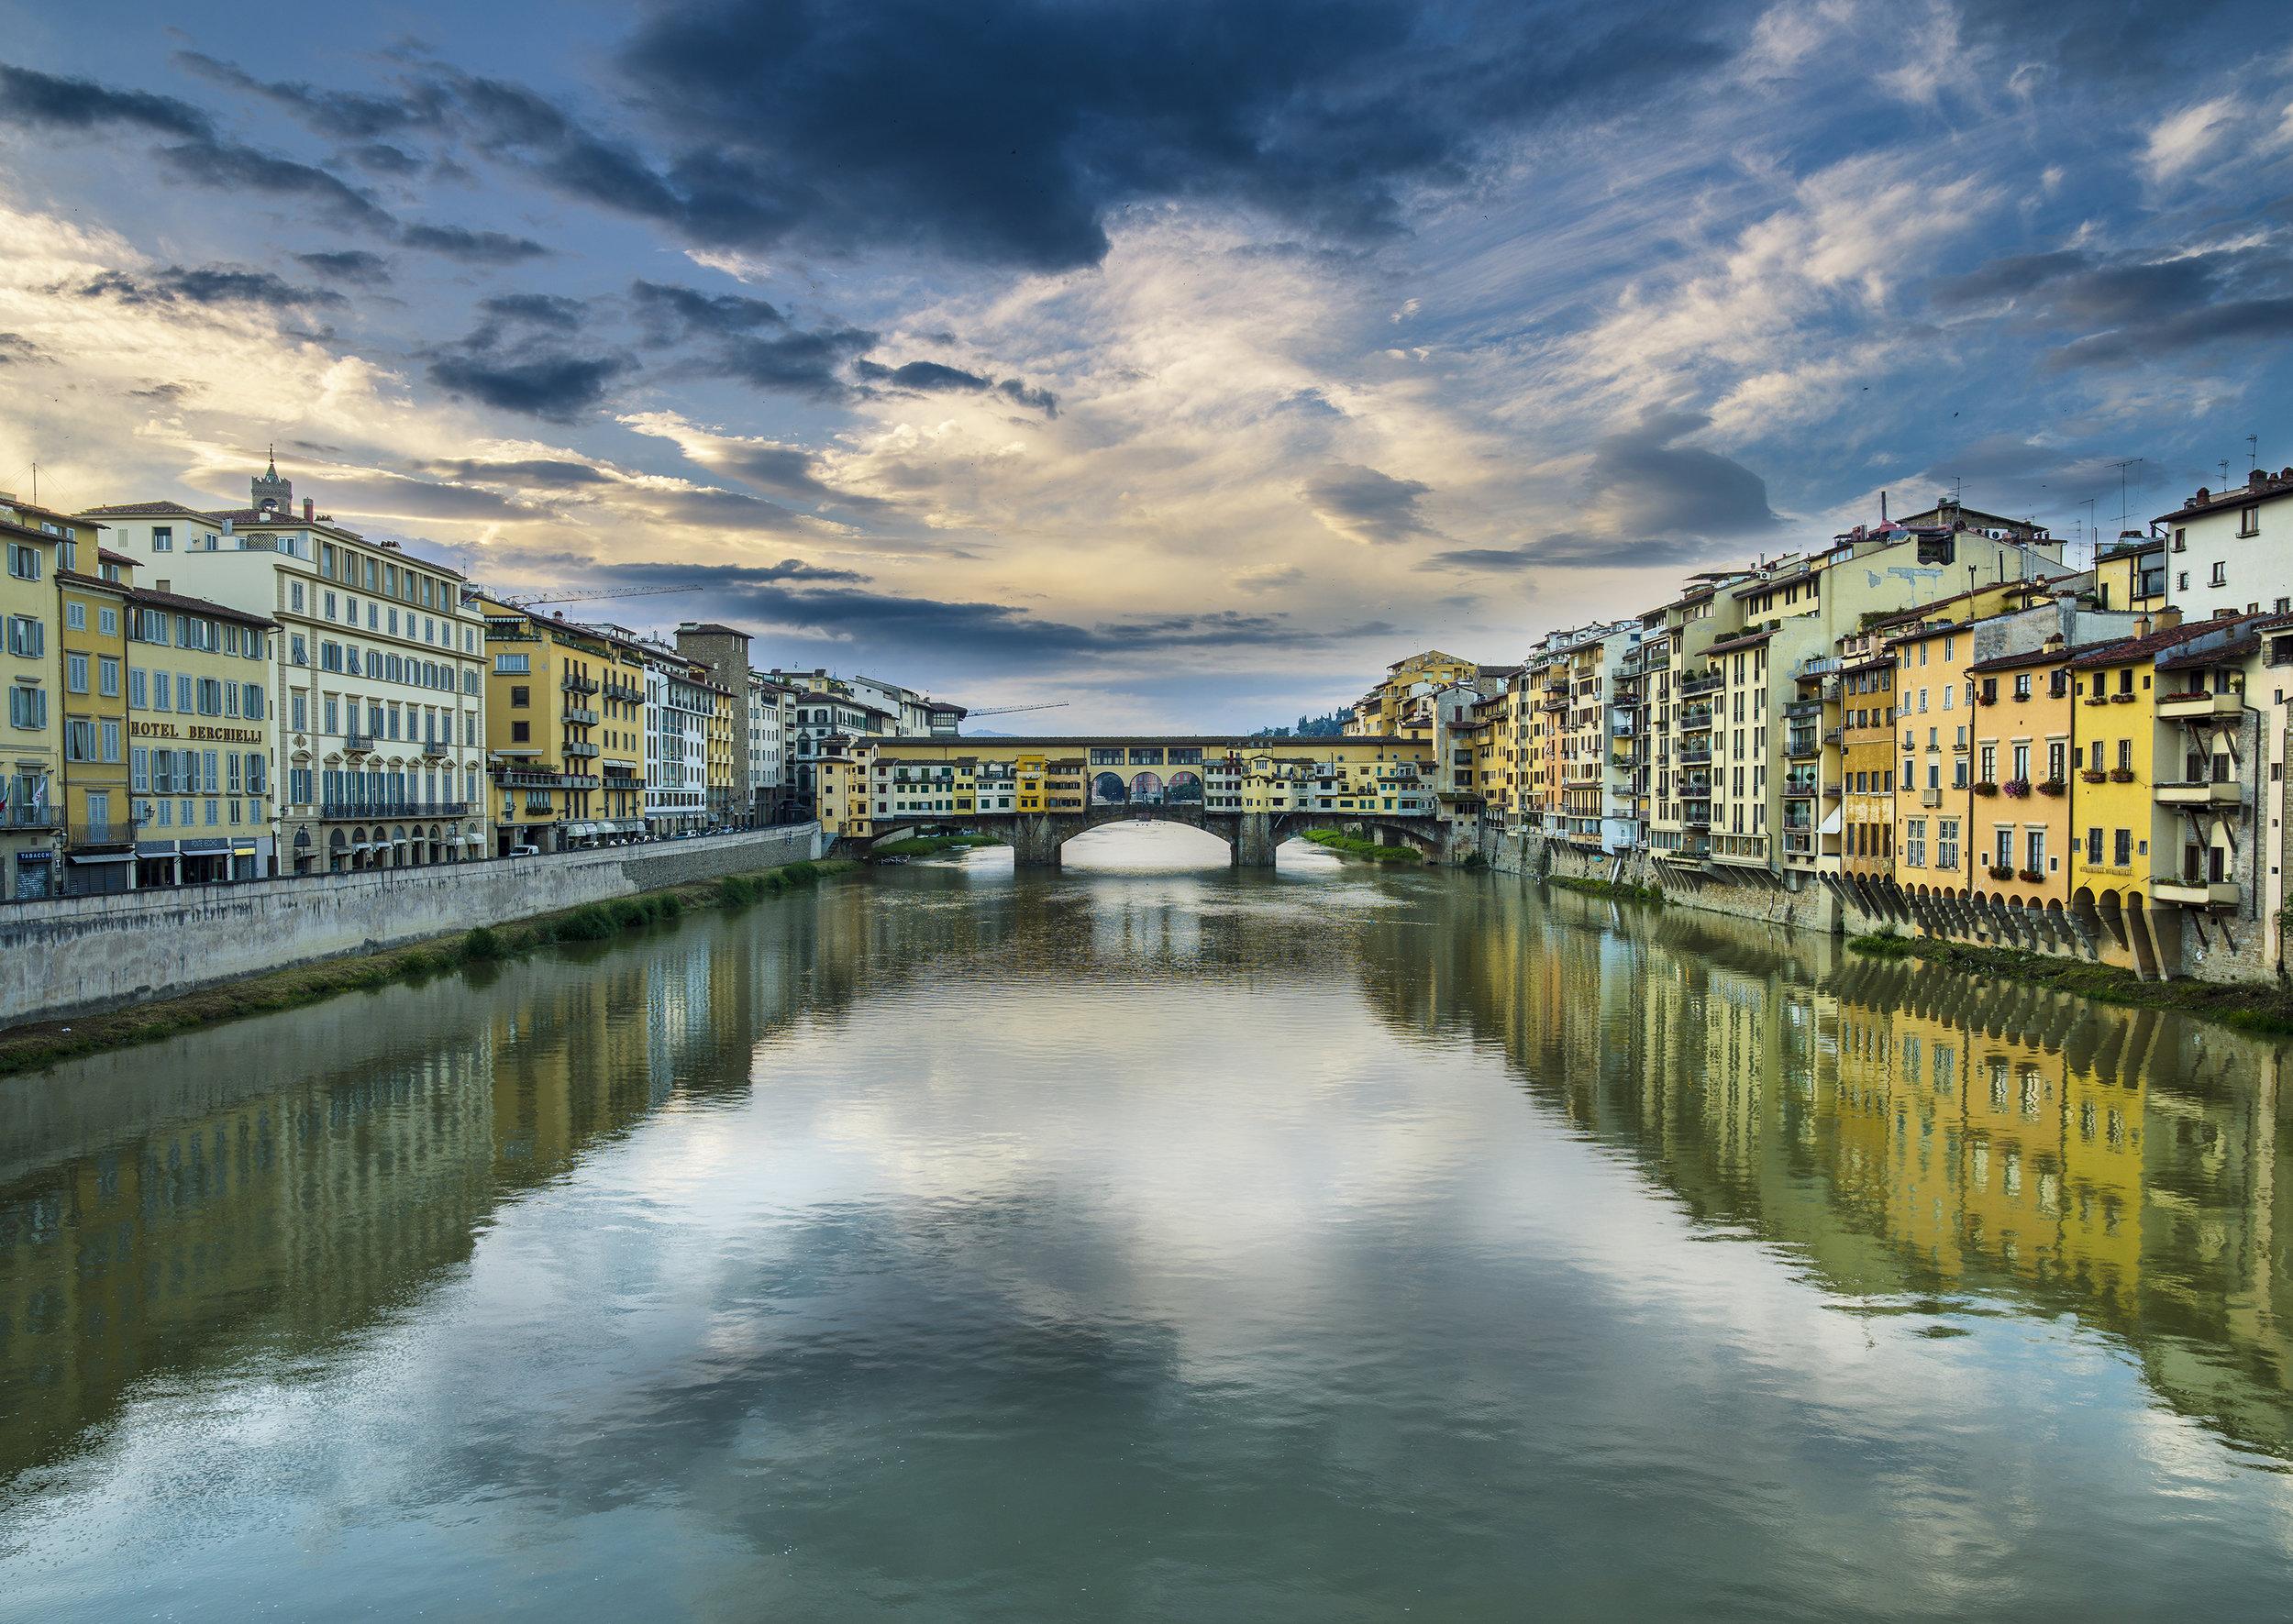 Italy, Arno and Ponte Vecchio. 2016